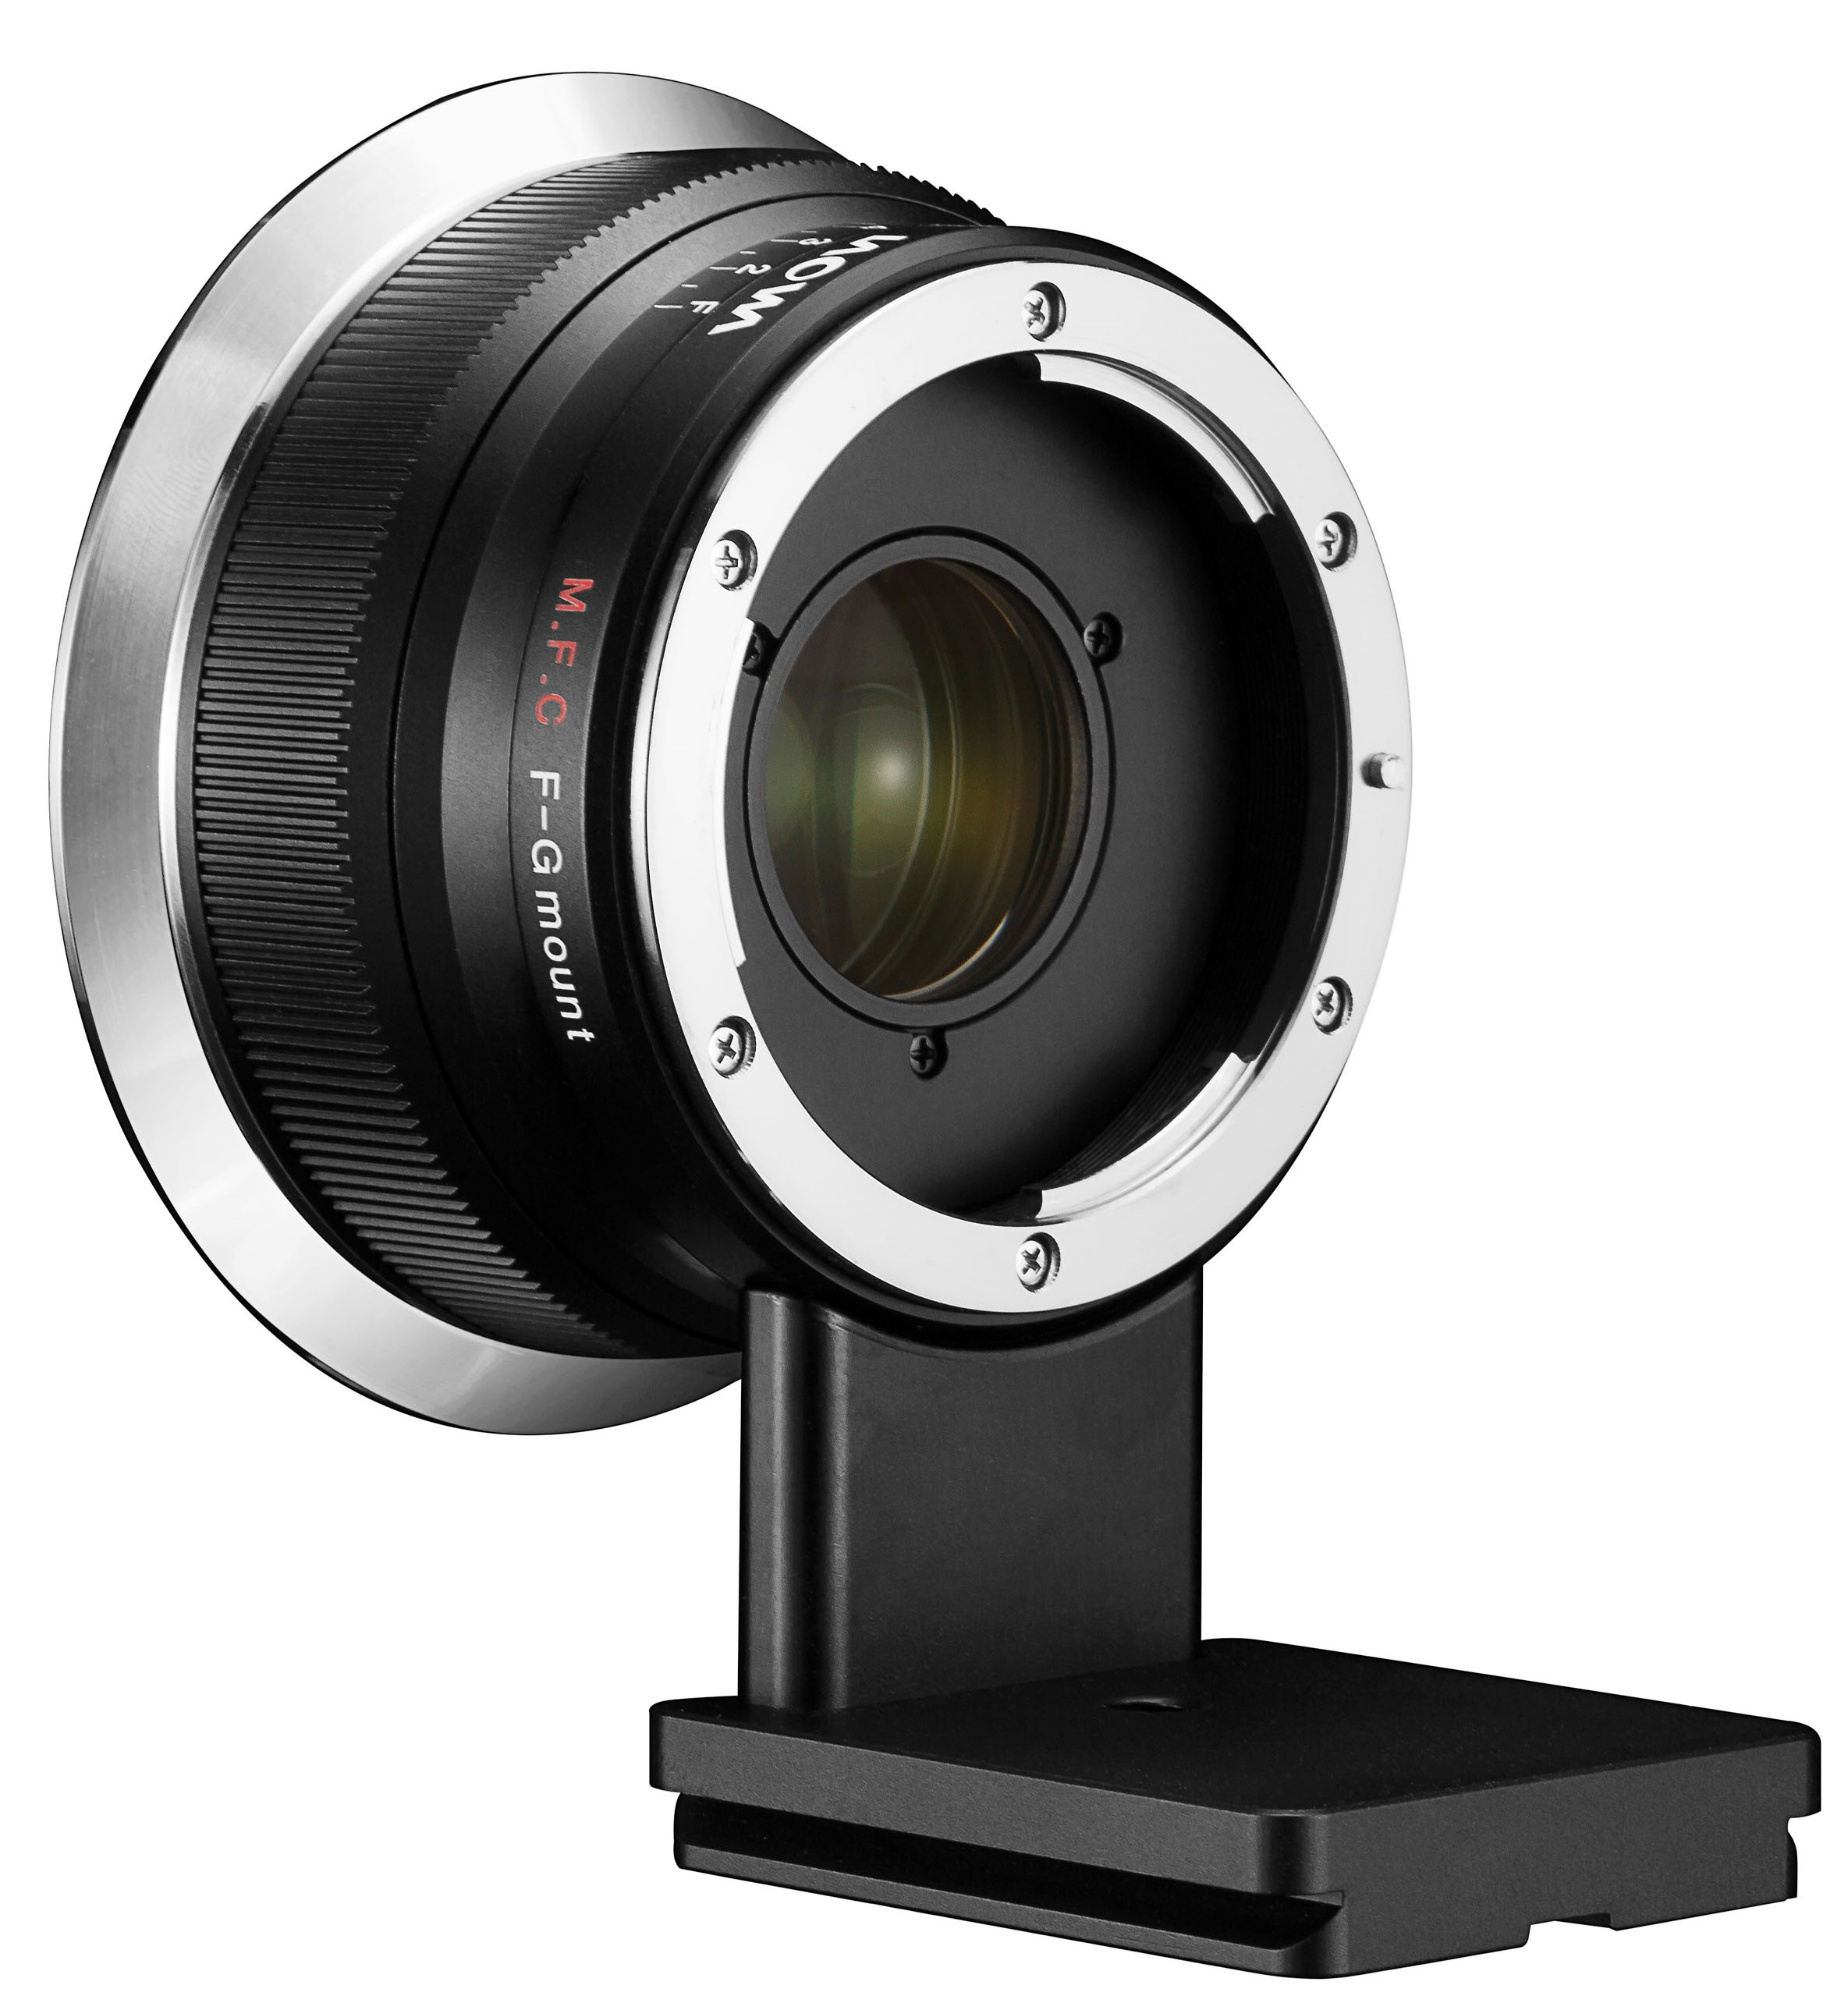 LAOWA telekonvertor 1,4x Magic Format pro objektiv Canon EOS na tělo Fuji GFX